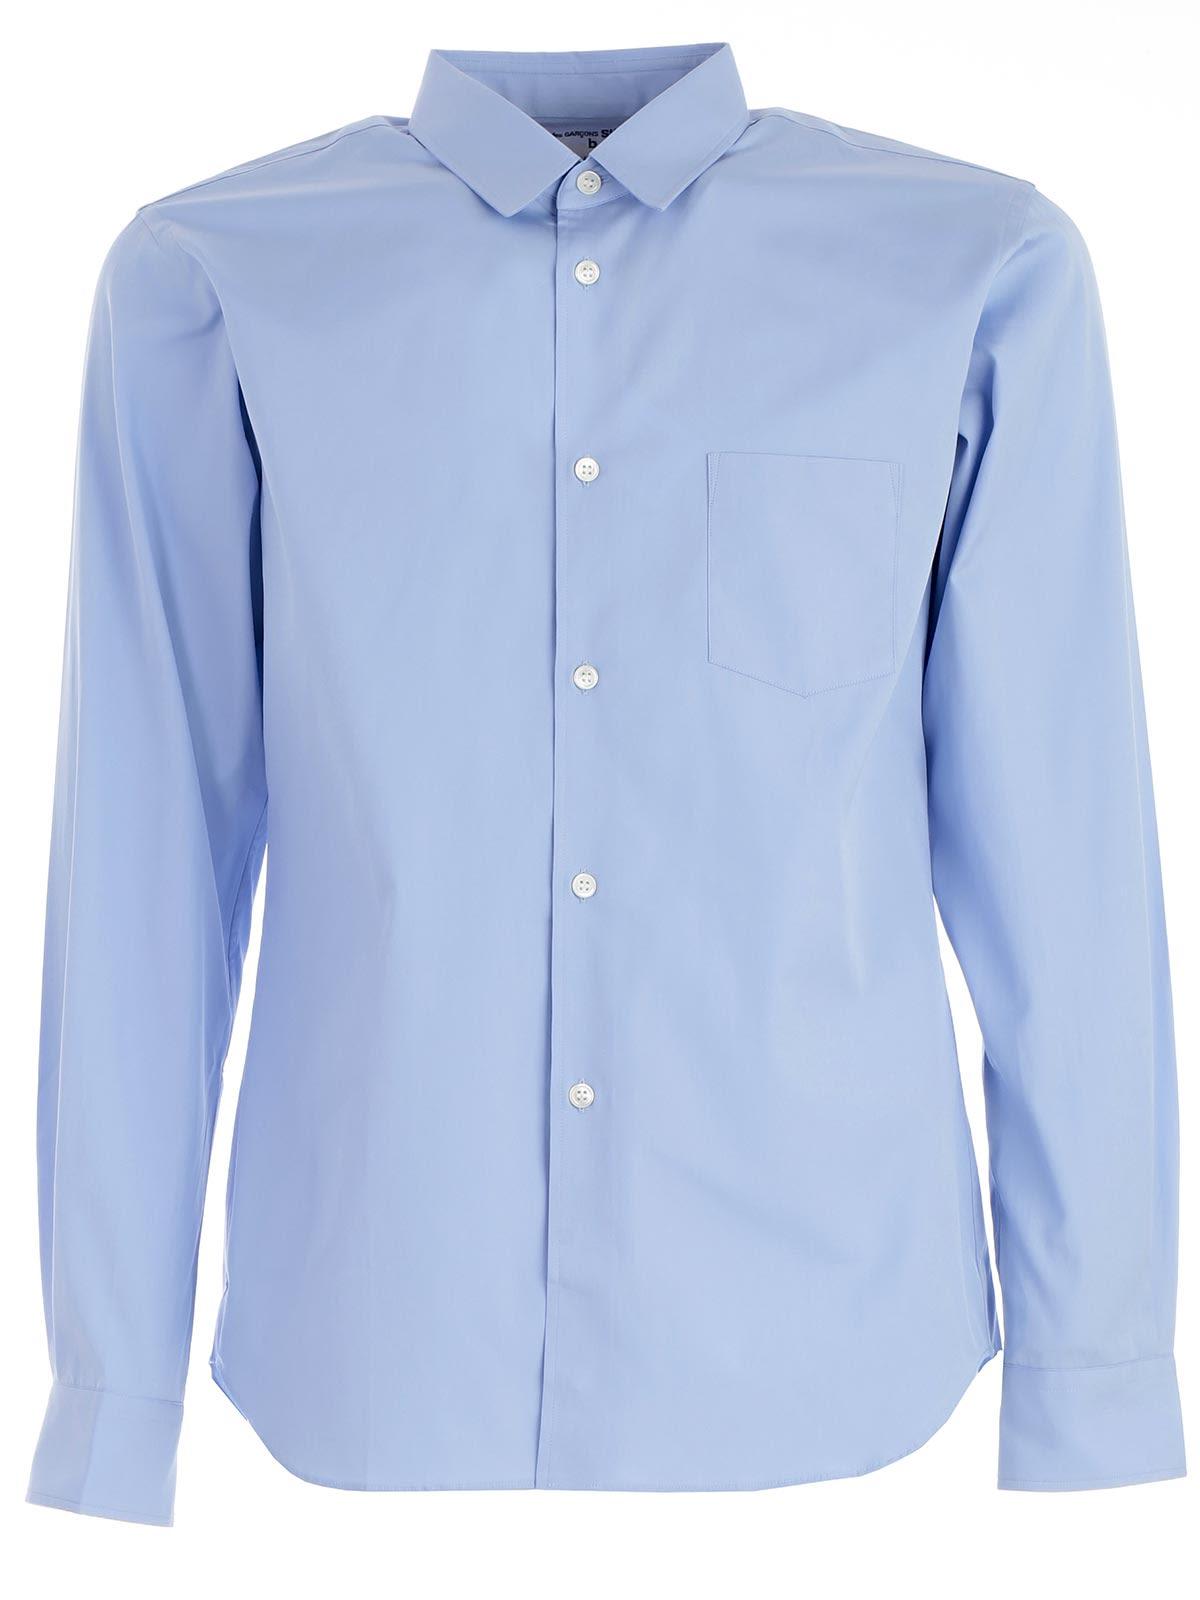 comme des garçons shirt boy -  Classic Patch Shirt